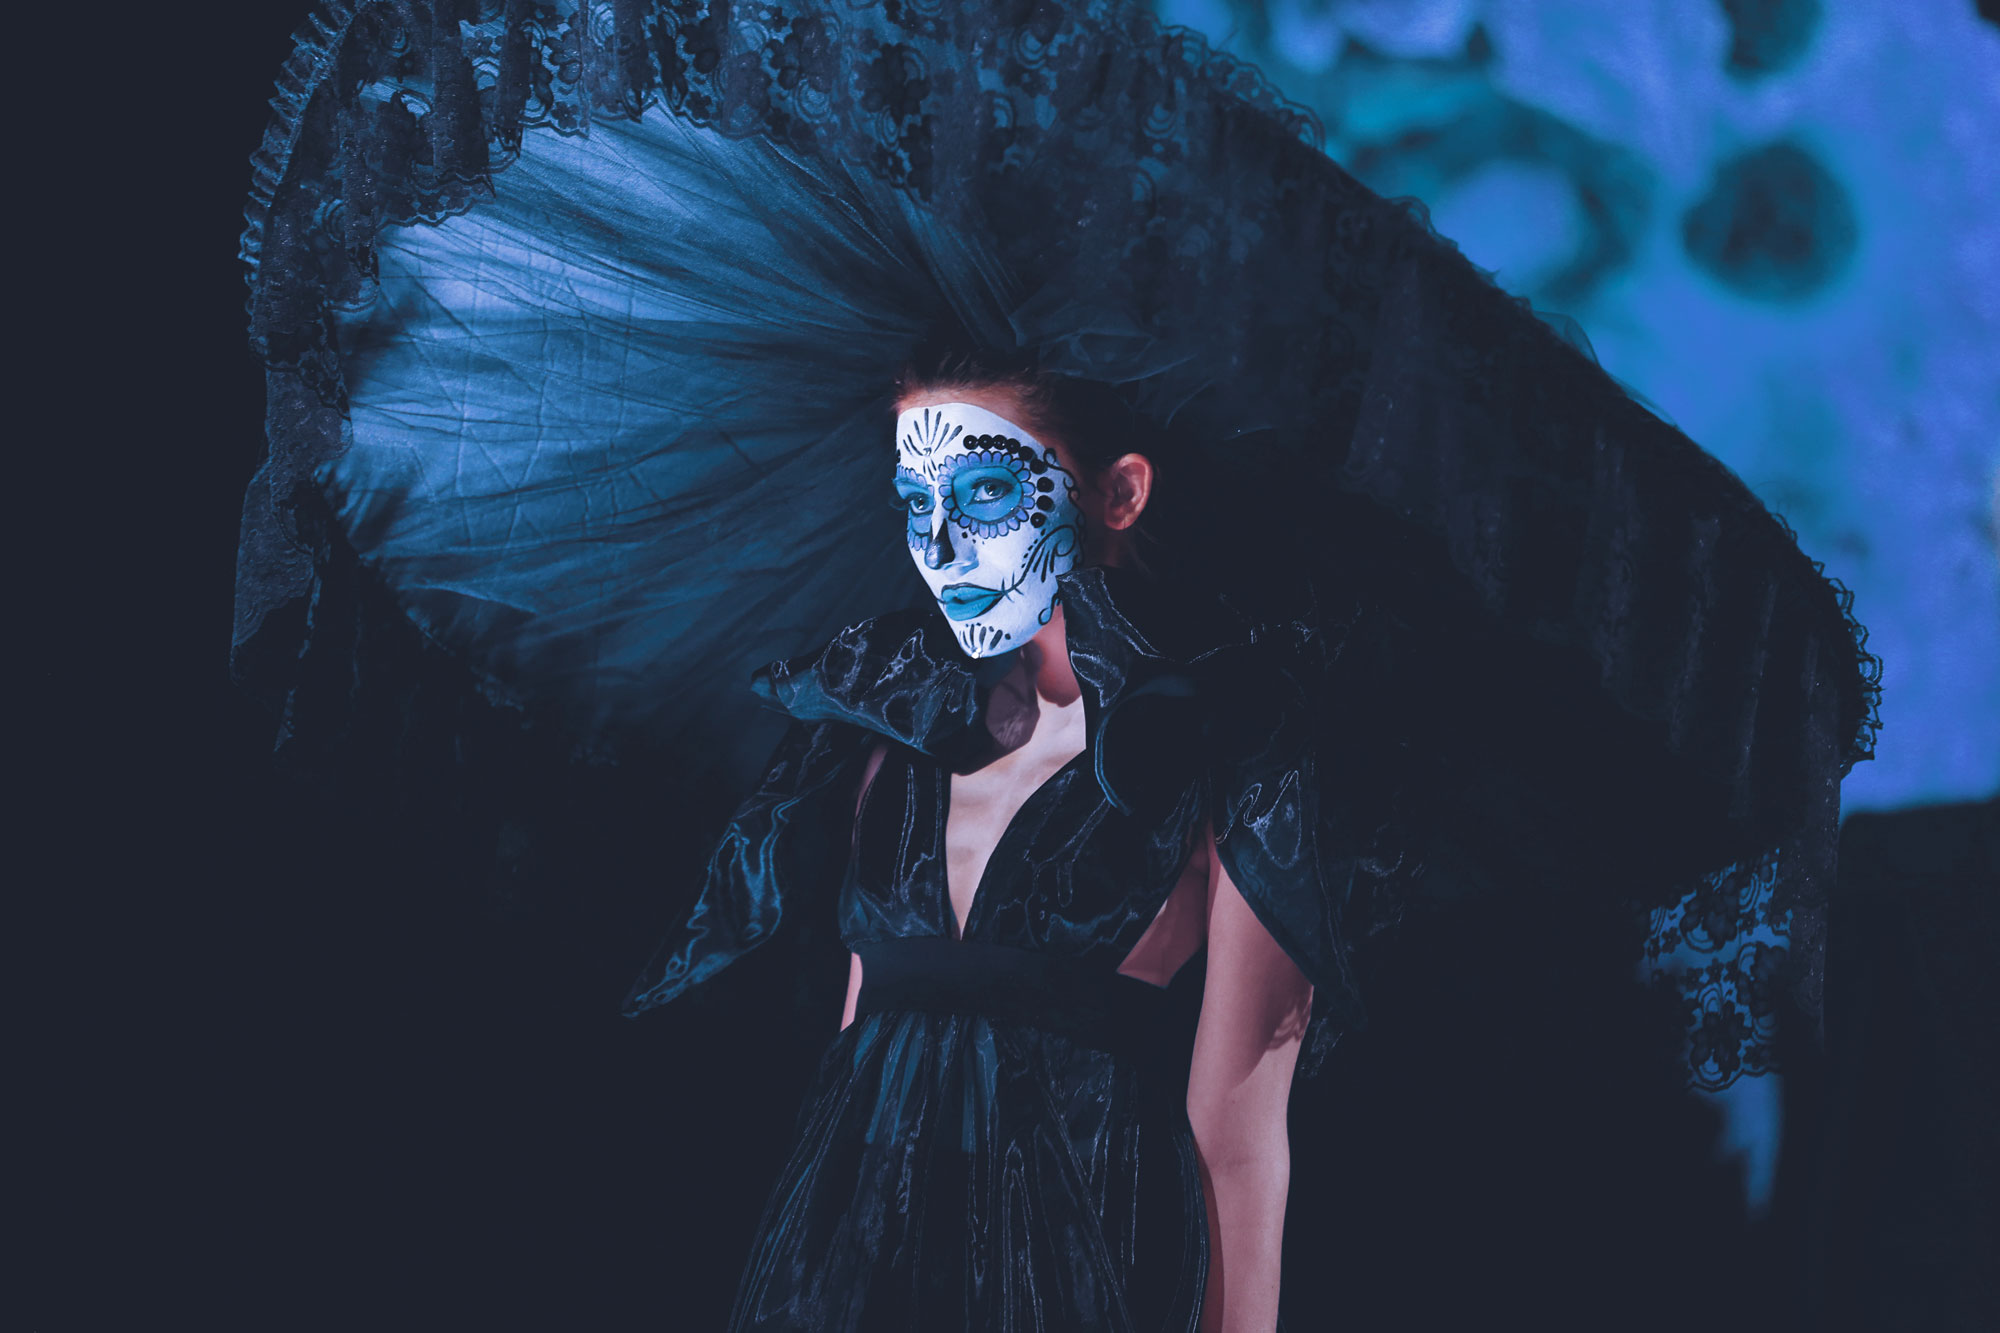 2015 Catrina-inspired fashion design by Midi Soliz. Photo by Krystal Malloy. Model: Callisto Grifith.